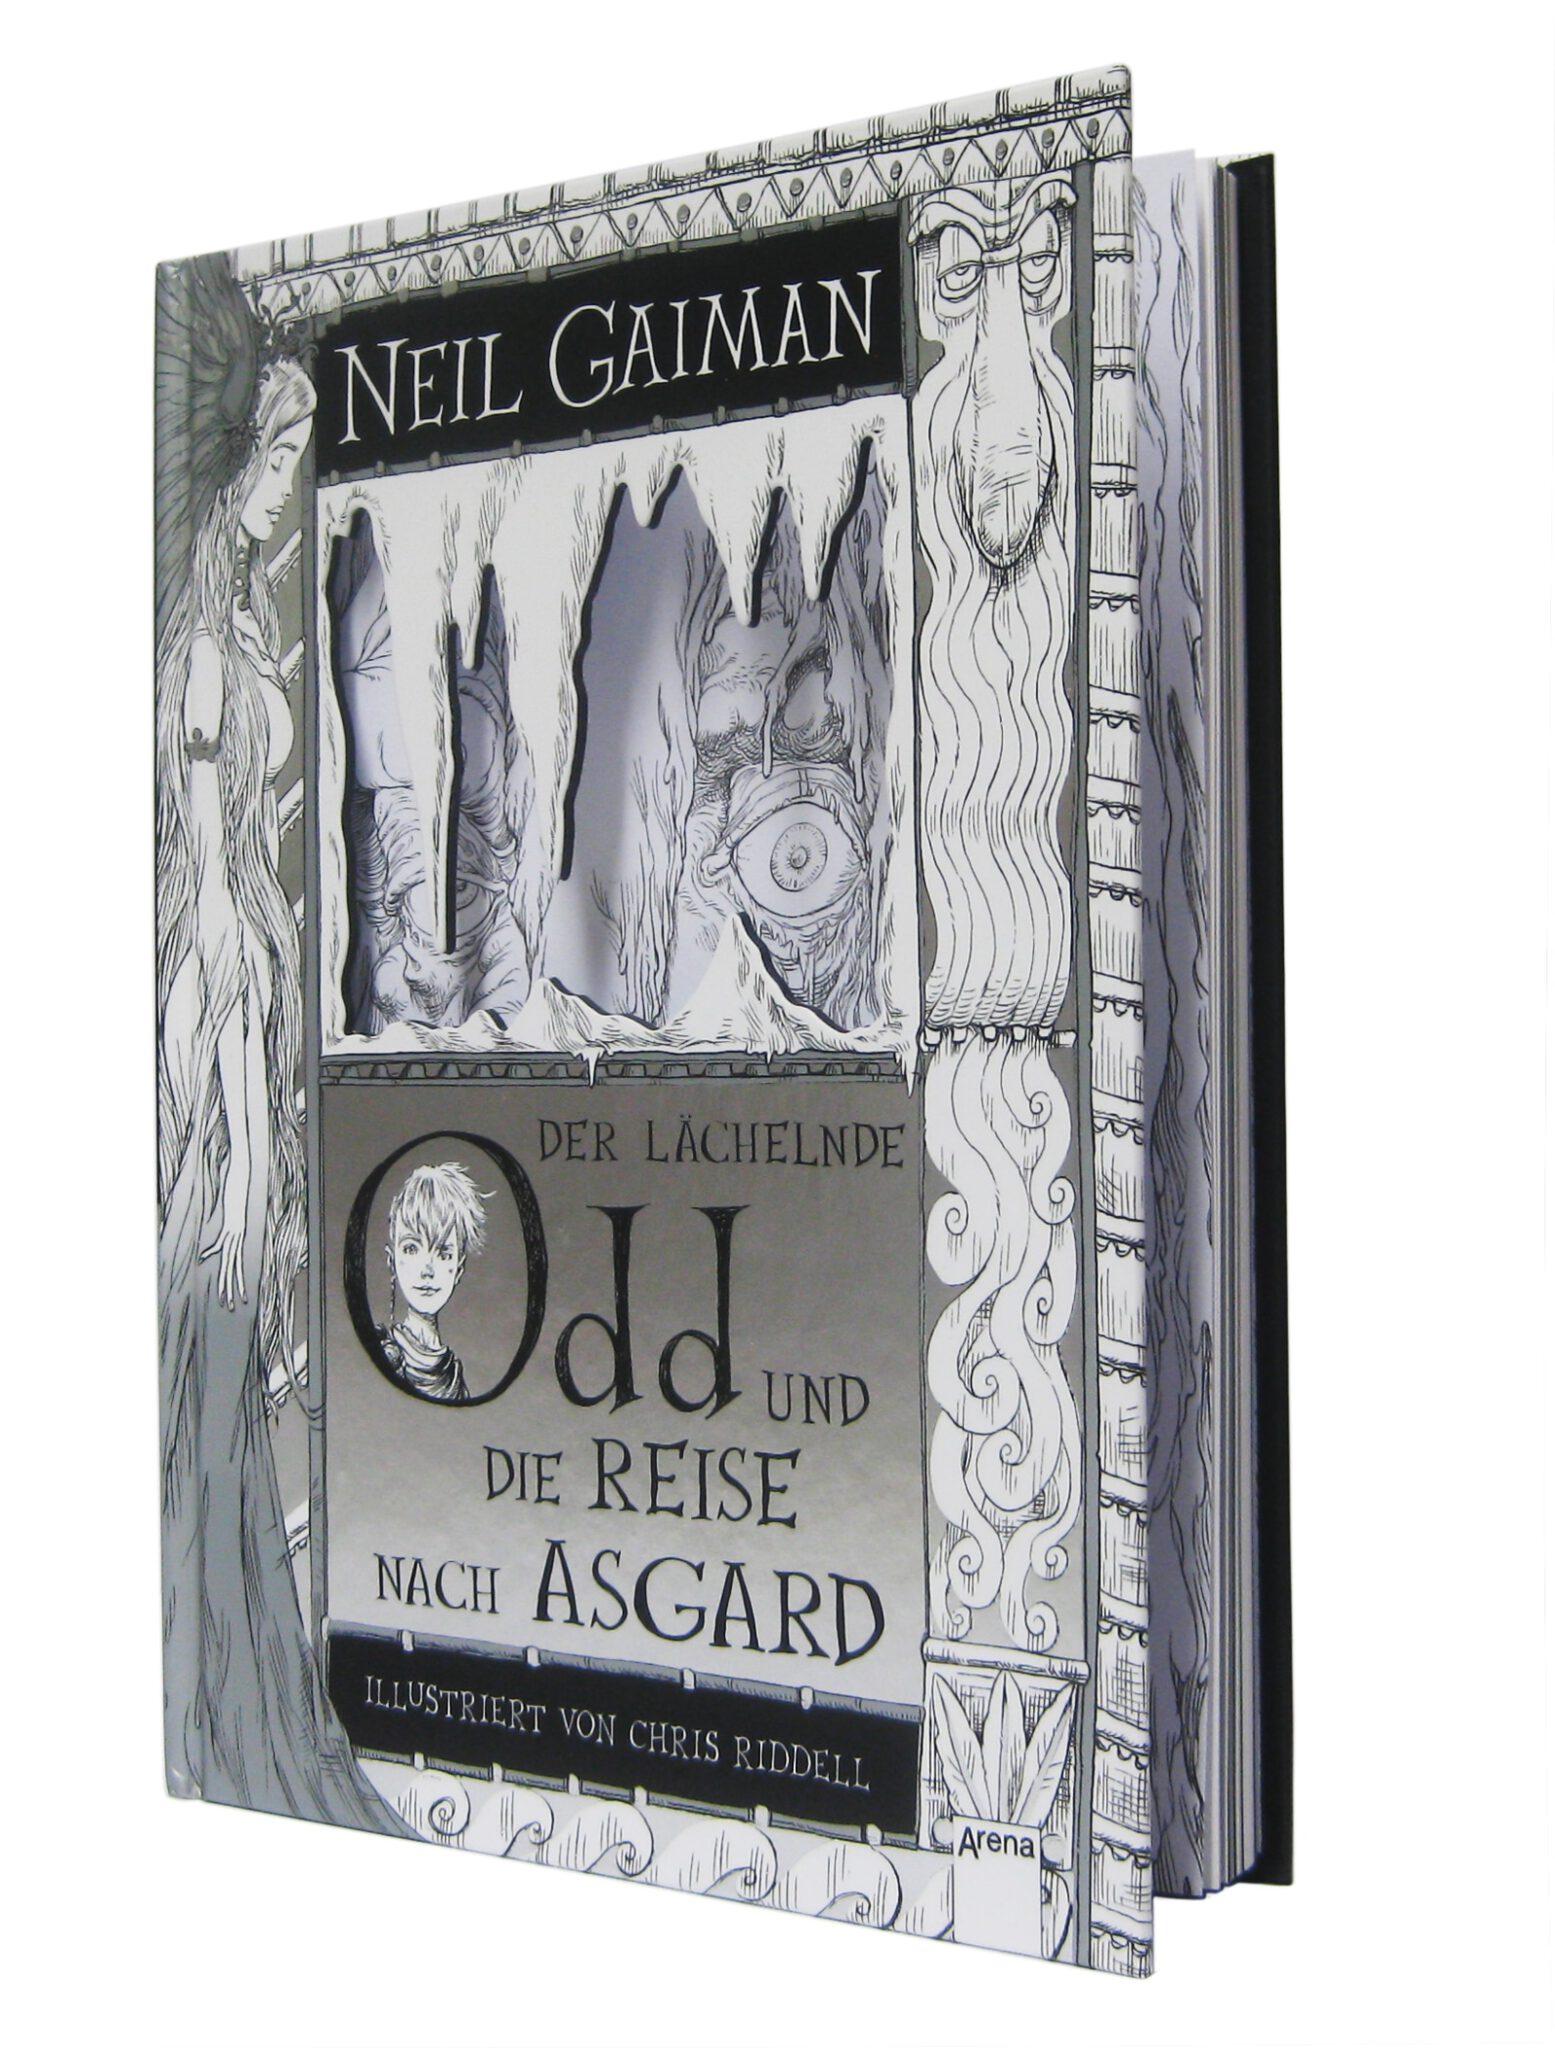 Coverabbildung vom Verlag